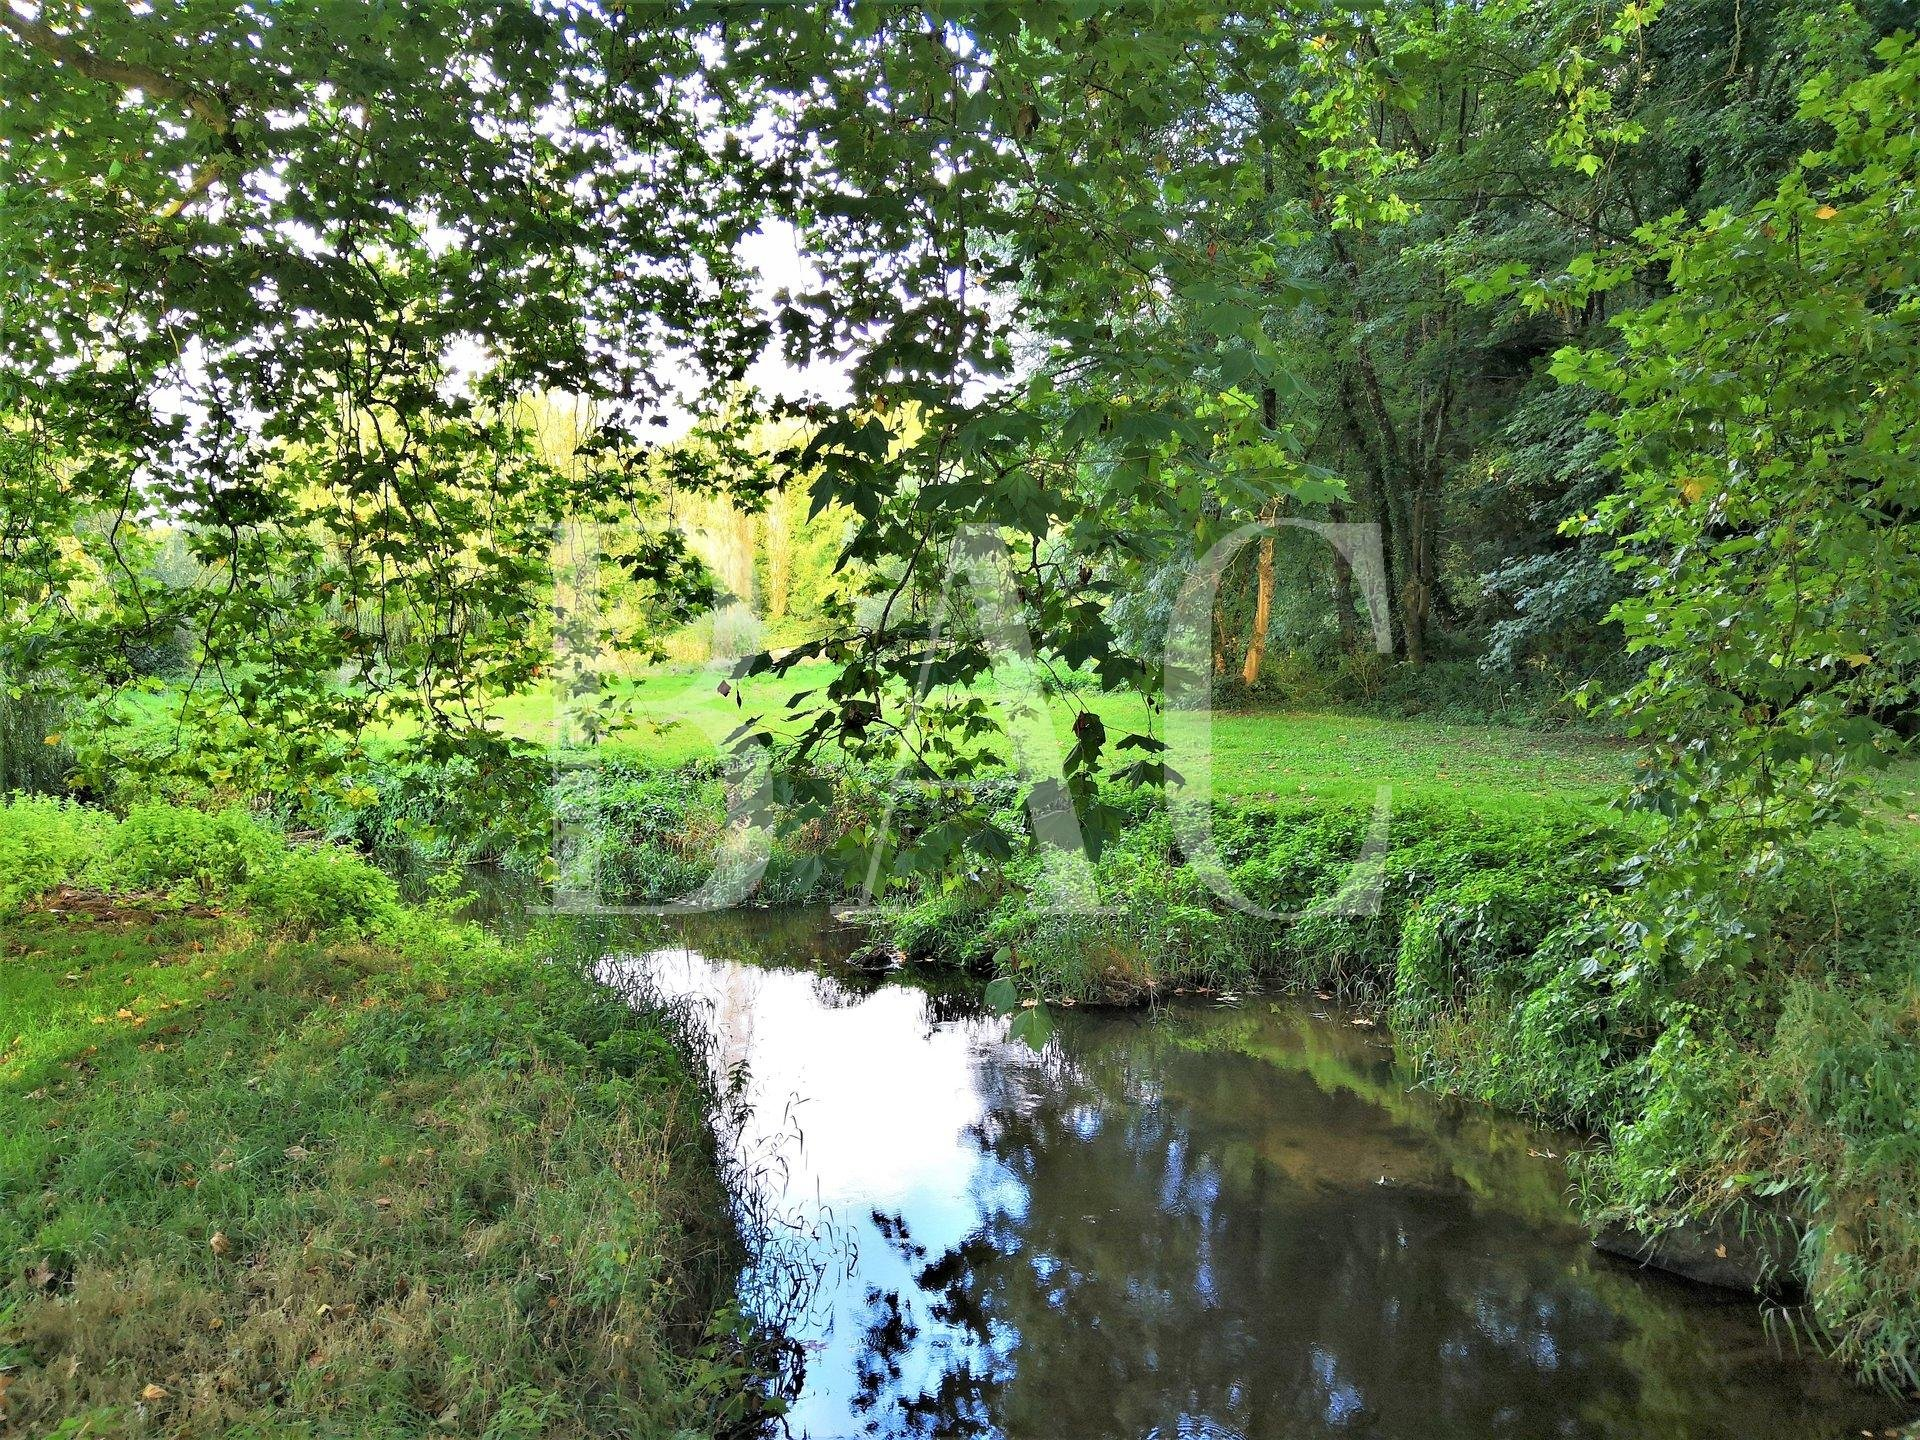 Bac-Estate-manoir-bretagne-parc-jardin-piscine-tennis-location-gites-arbres-campagne-mer-littoral-riviere-chateau-villa-grande-propriete-cote-armor